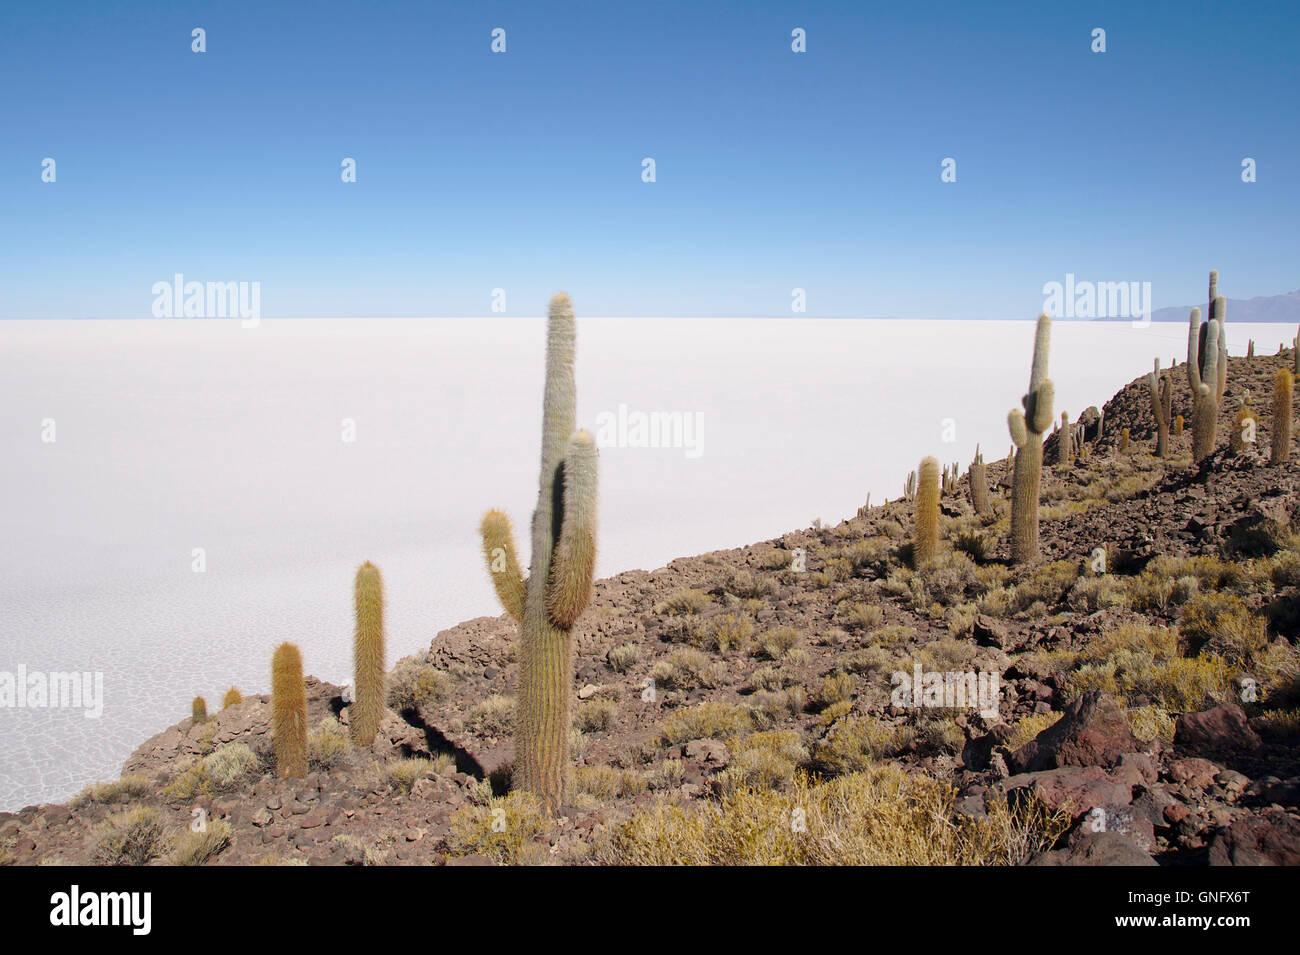 Kakteen (Trichocereus nomenklatorisches) auf Isla Incahuasi mit Salar de Uyuni, Bolivien Stockbild